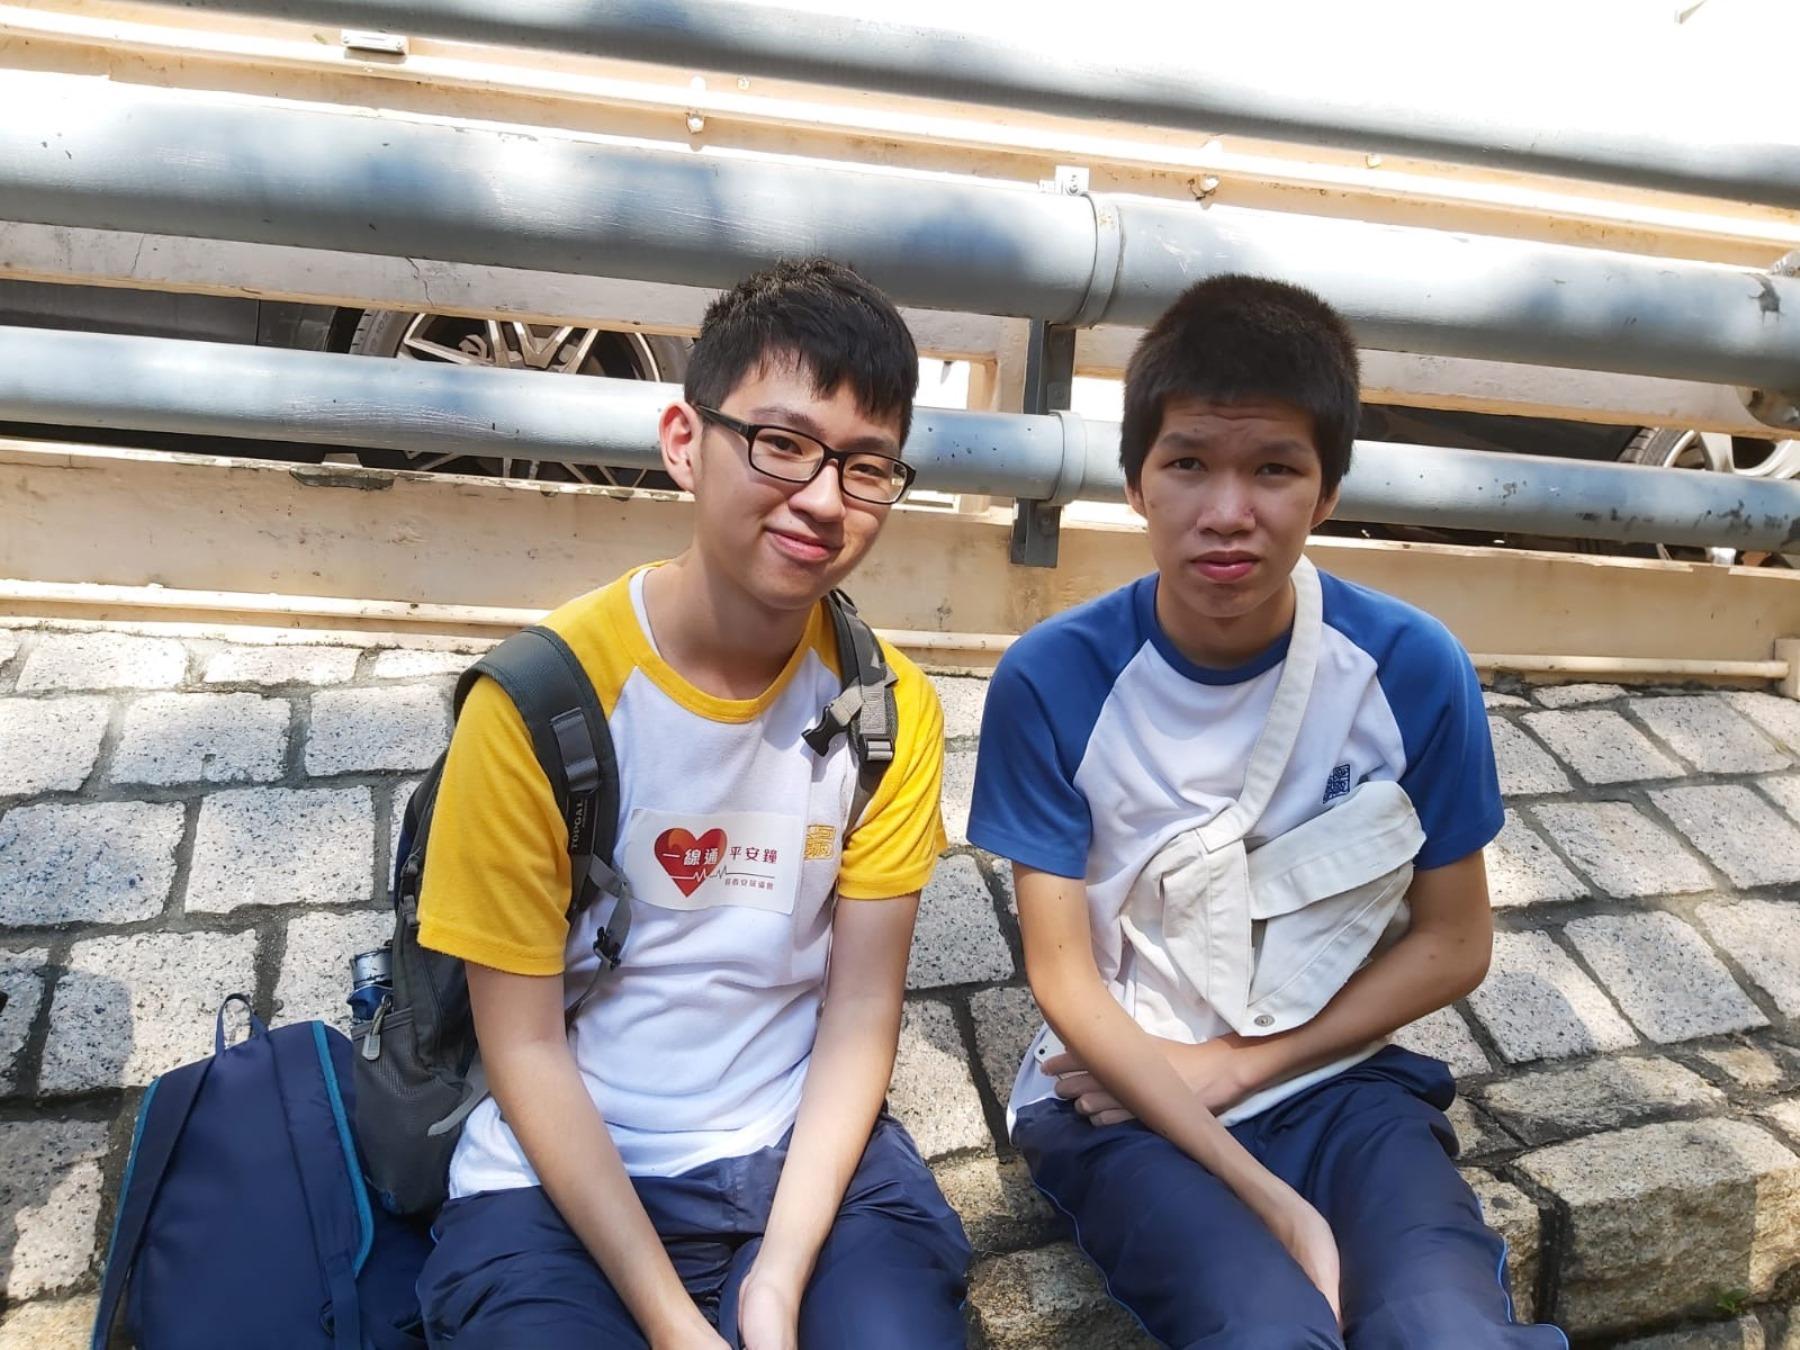 https://www.npc.edu.hk/sites/default/files/2_1359.jpg